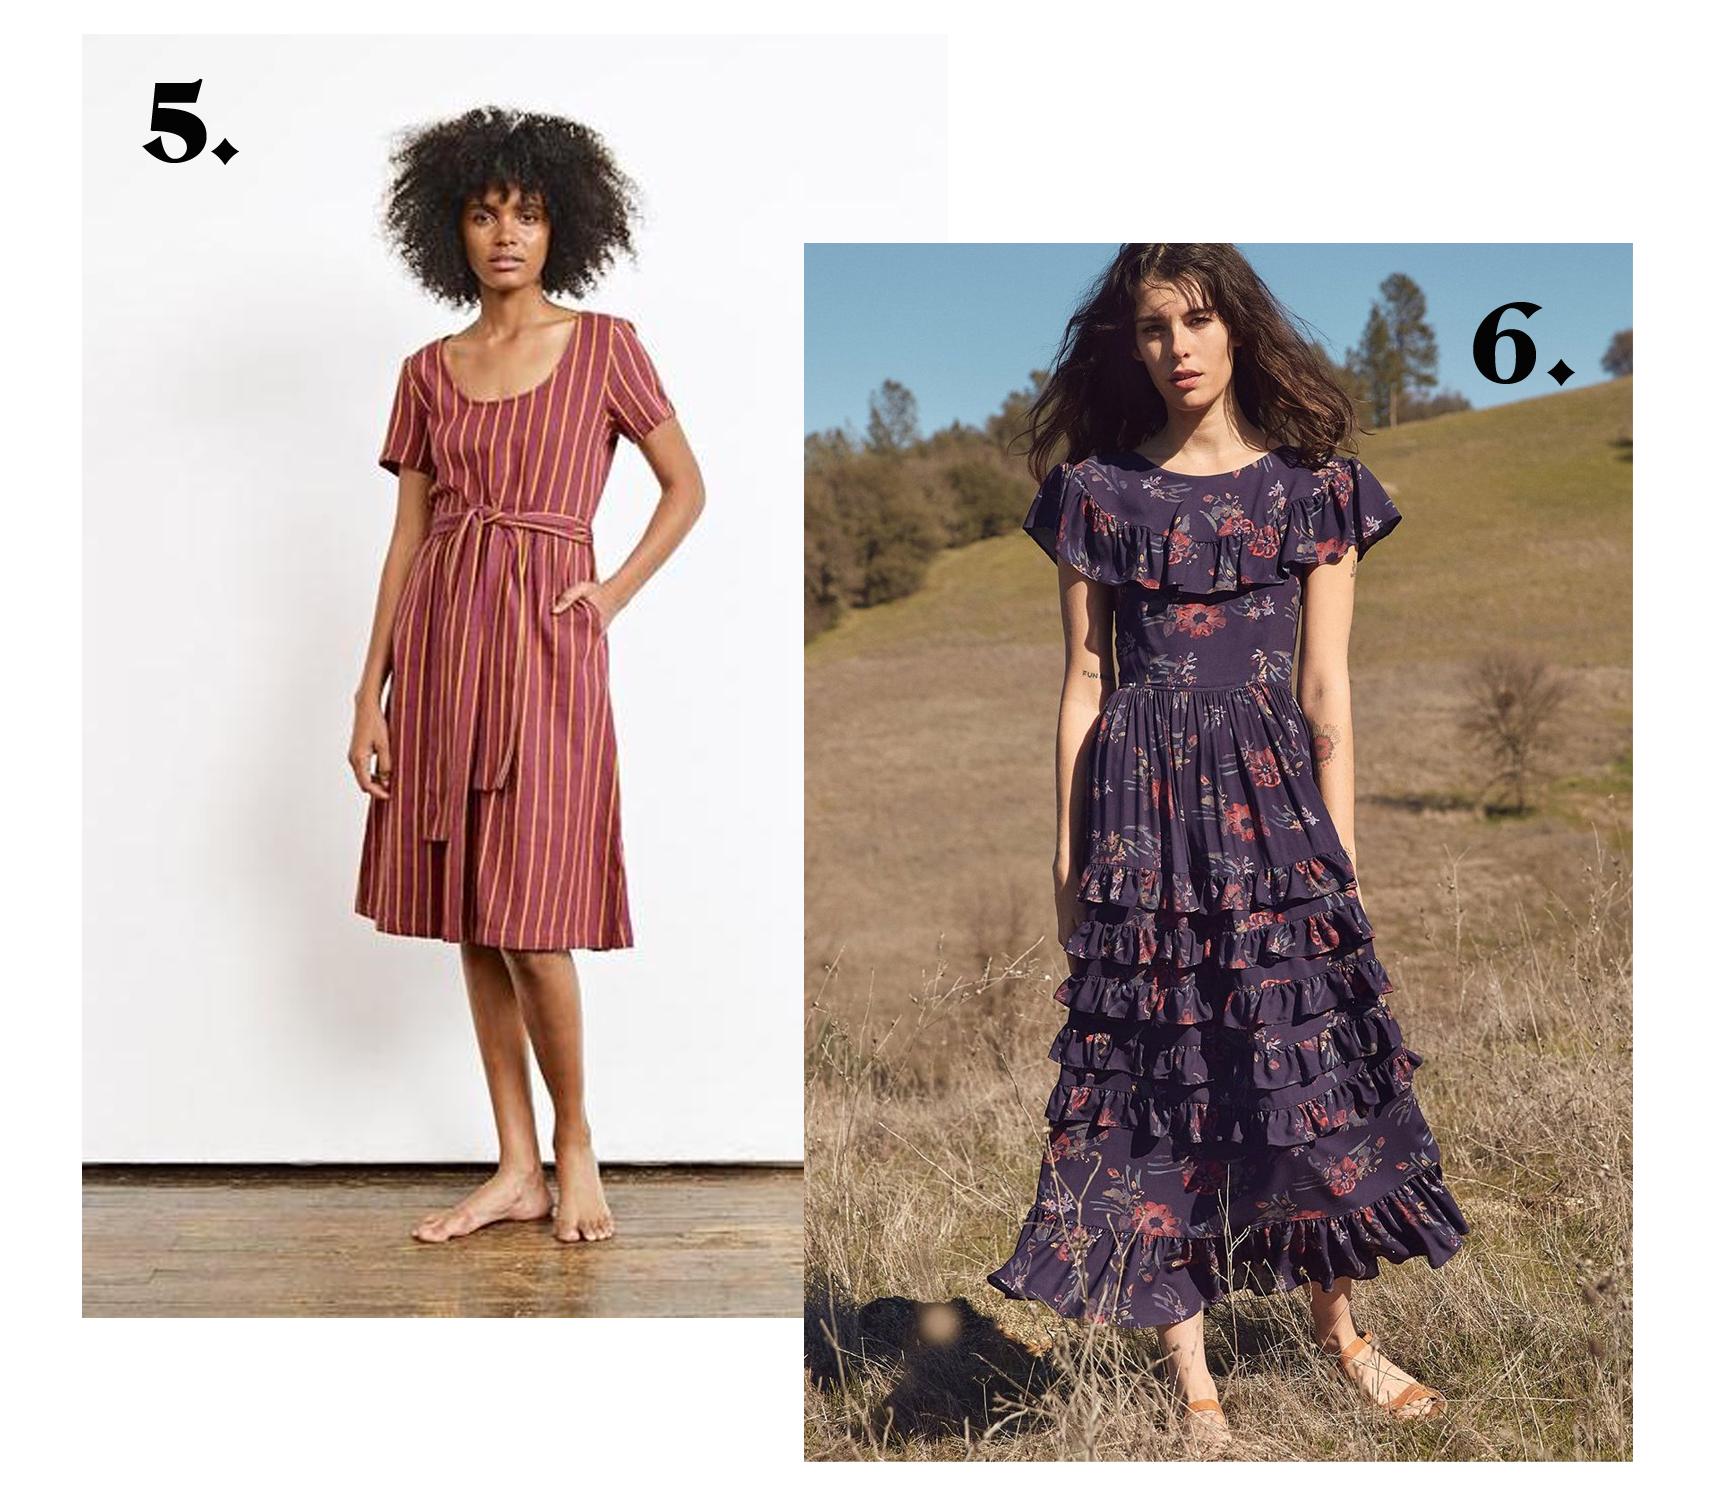 dresses-3.png